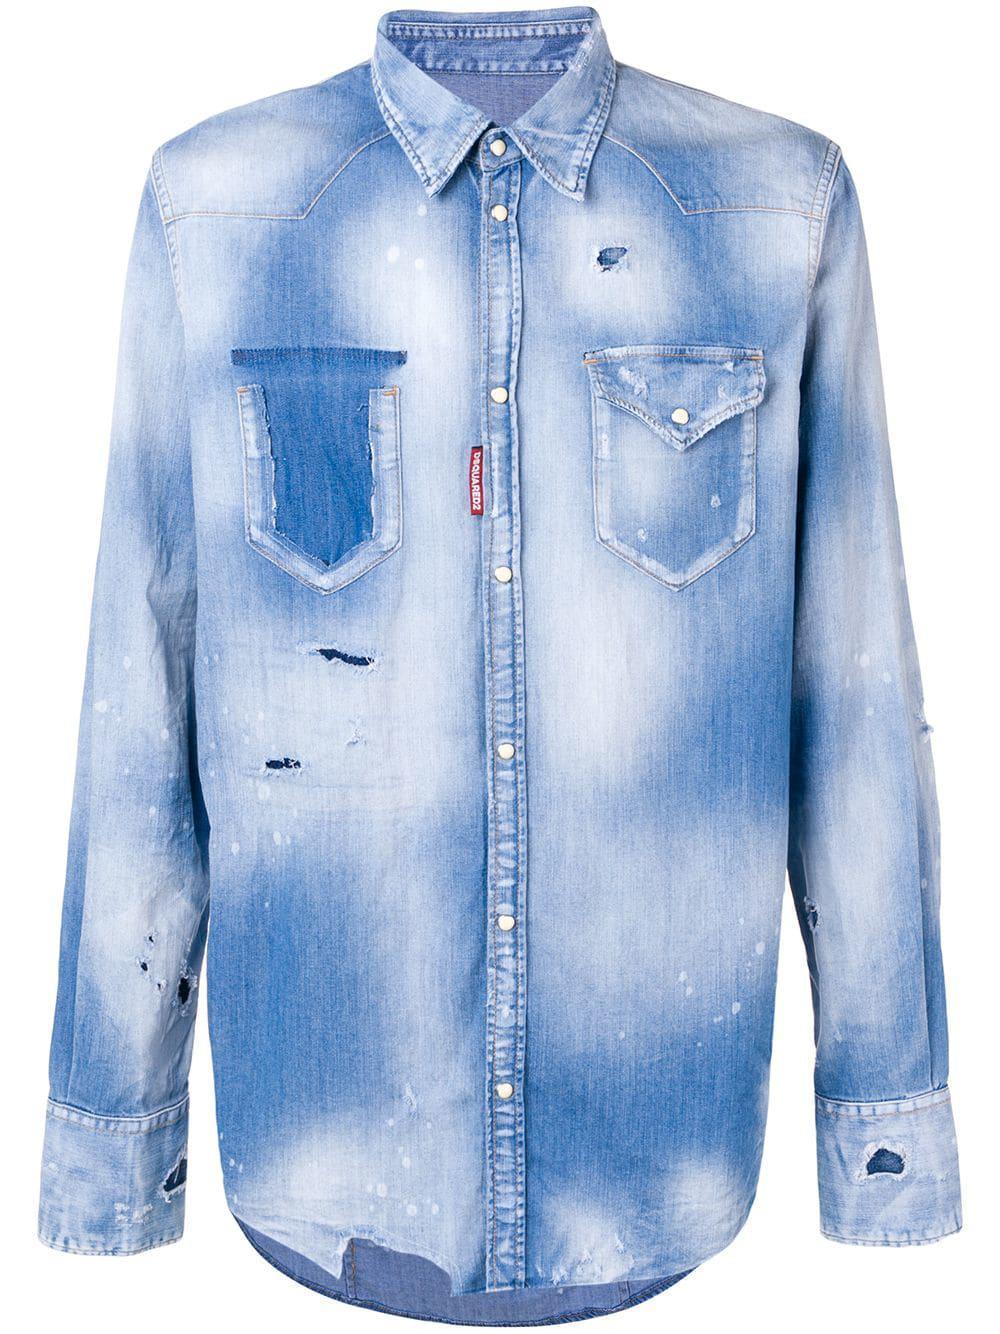 37a2c7ec02 Lyst - Dsquared² Denim Shirt in Blue for Men